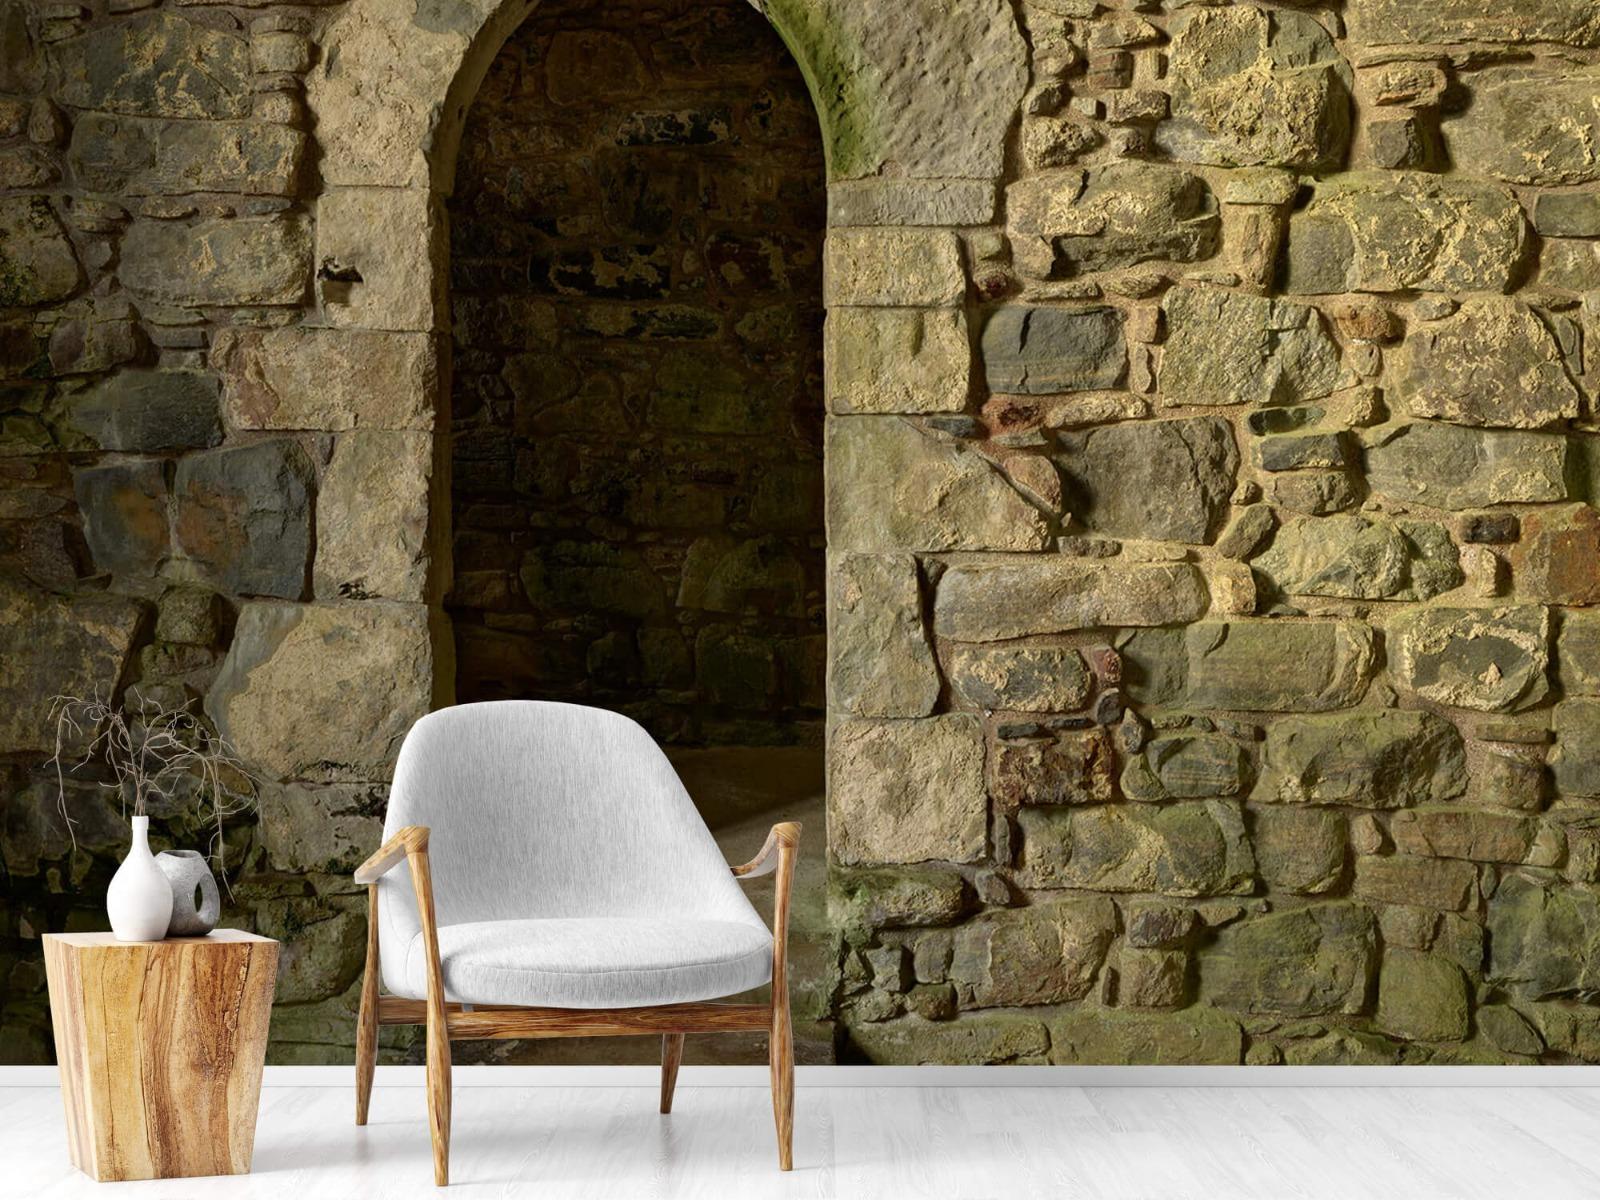 Steen behang - Oude muur met doorgang - Slaapkamer 18